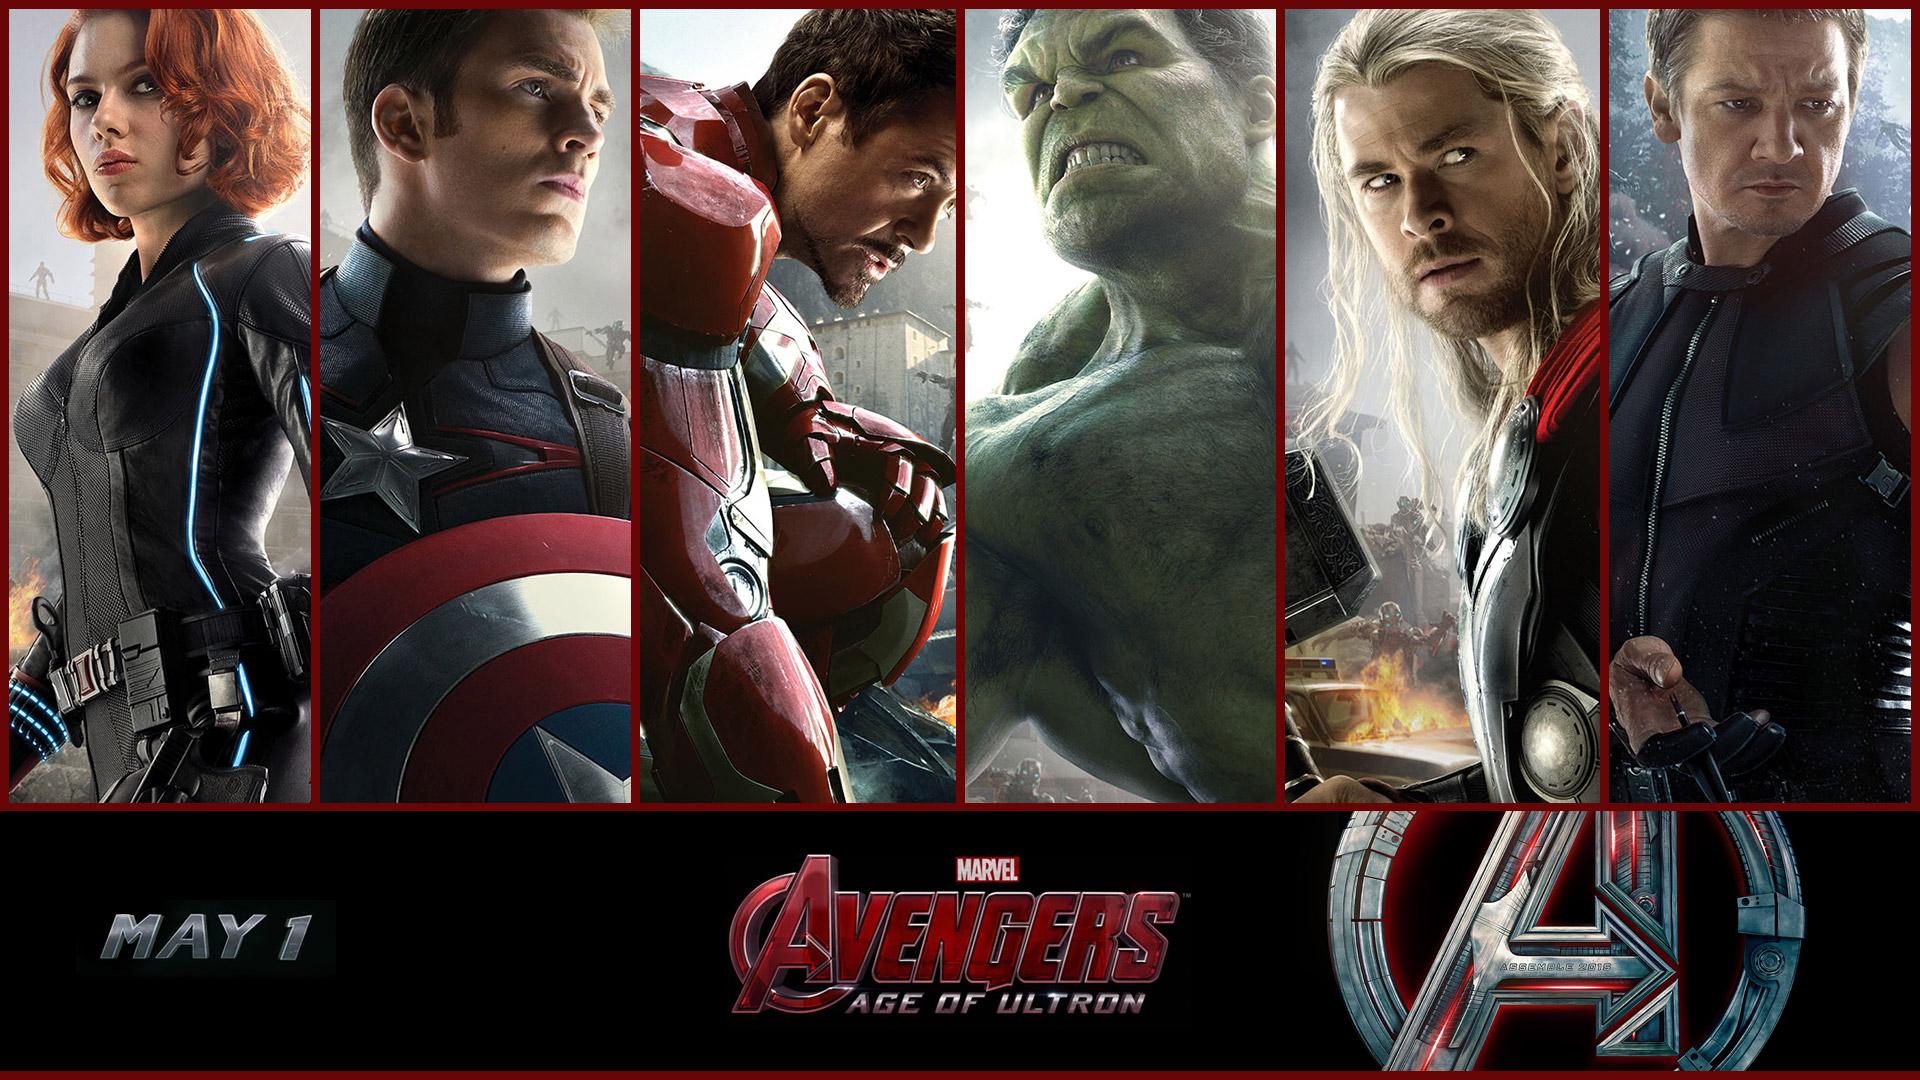 Hd Wallpapers Age Of Ultron Avengers 1920 X 1080 979 Kb Jpeg HD 1920x1080